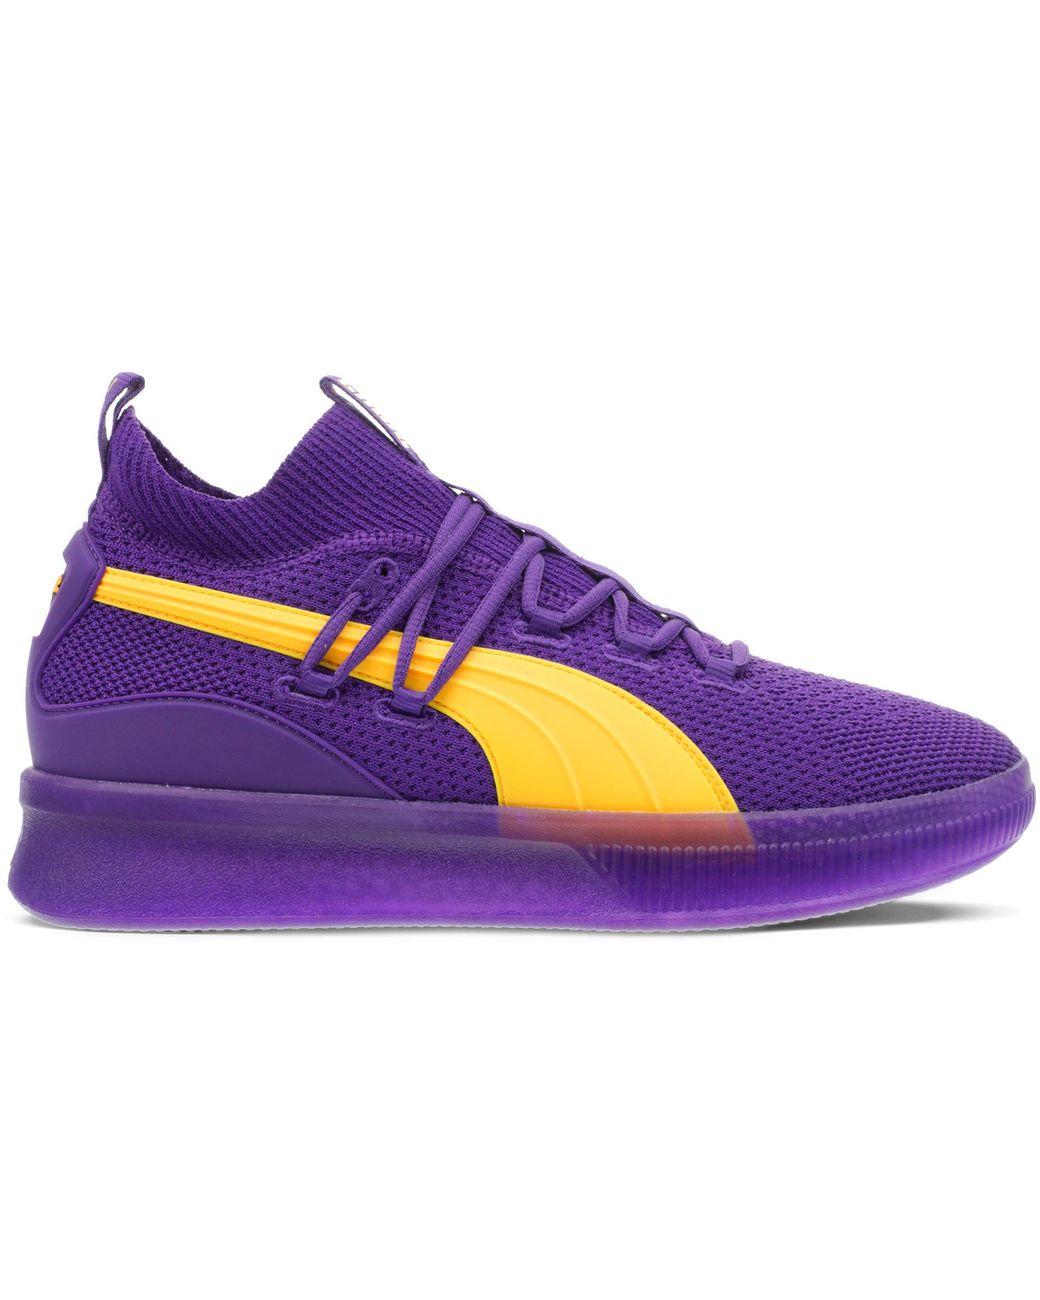 clyde court purple